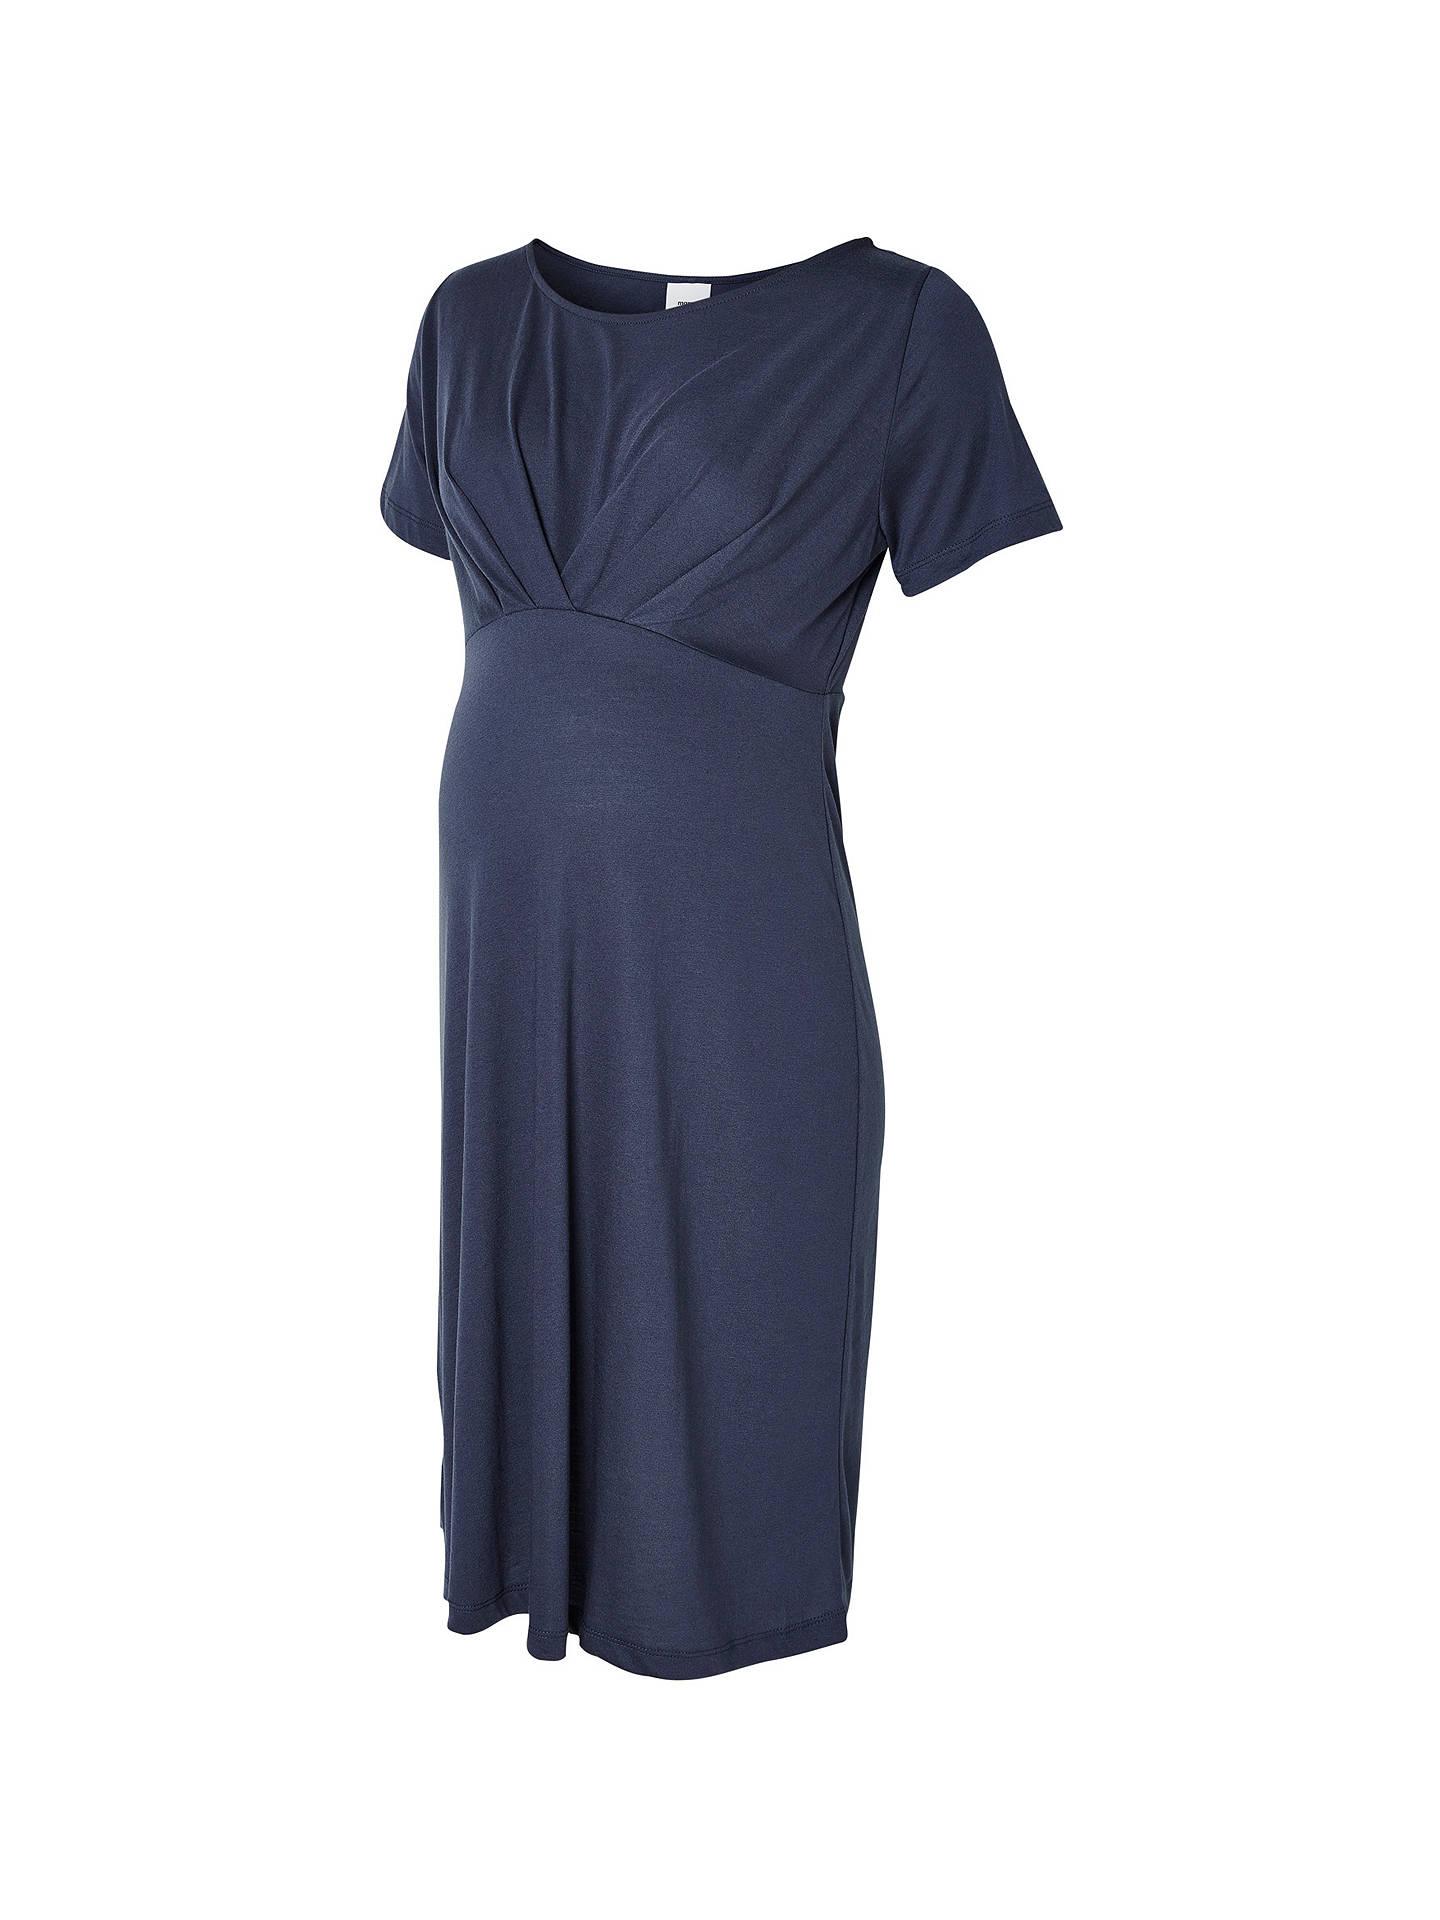 071f809962962 Buy Mamalicious Sella Short Sleeve Maternity Jersey Dress, Blue, S Online  at johnlewis.